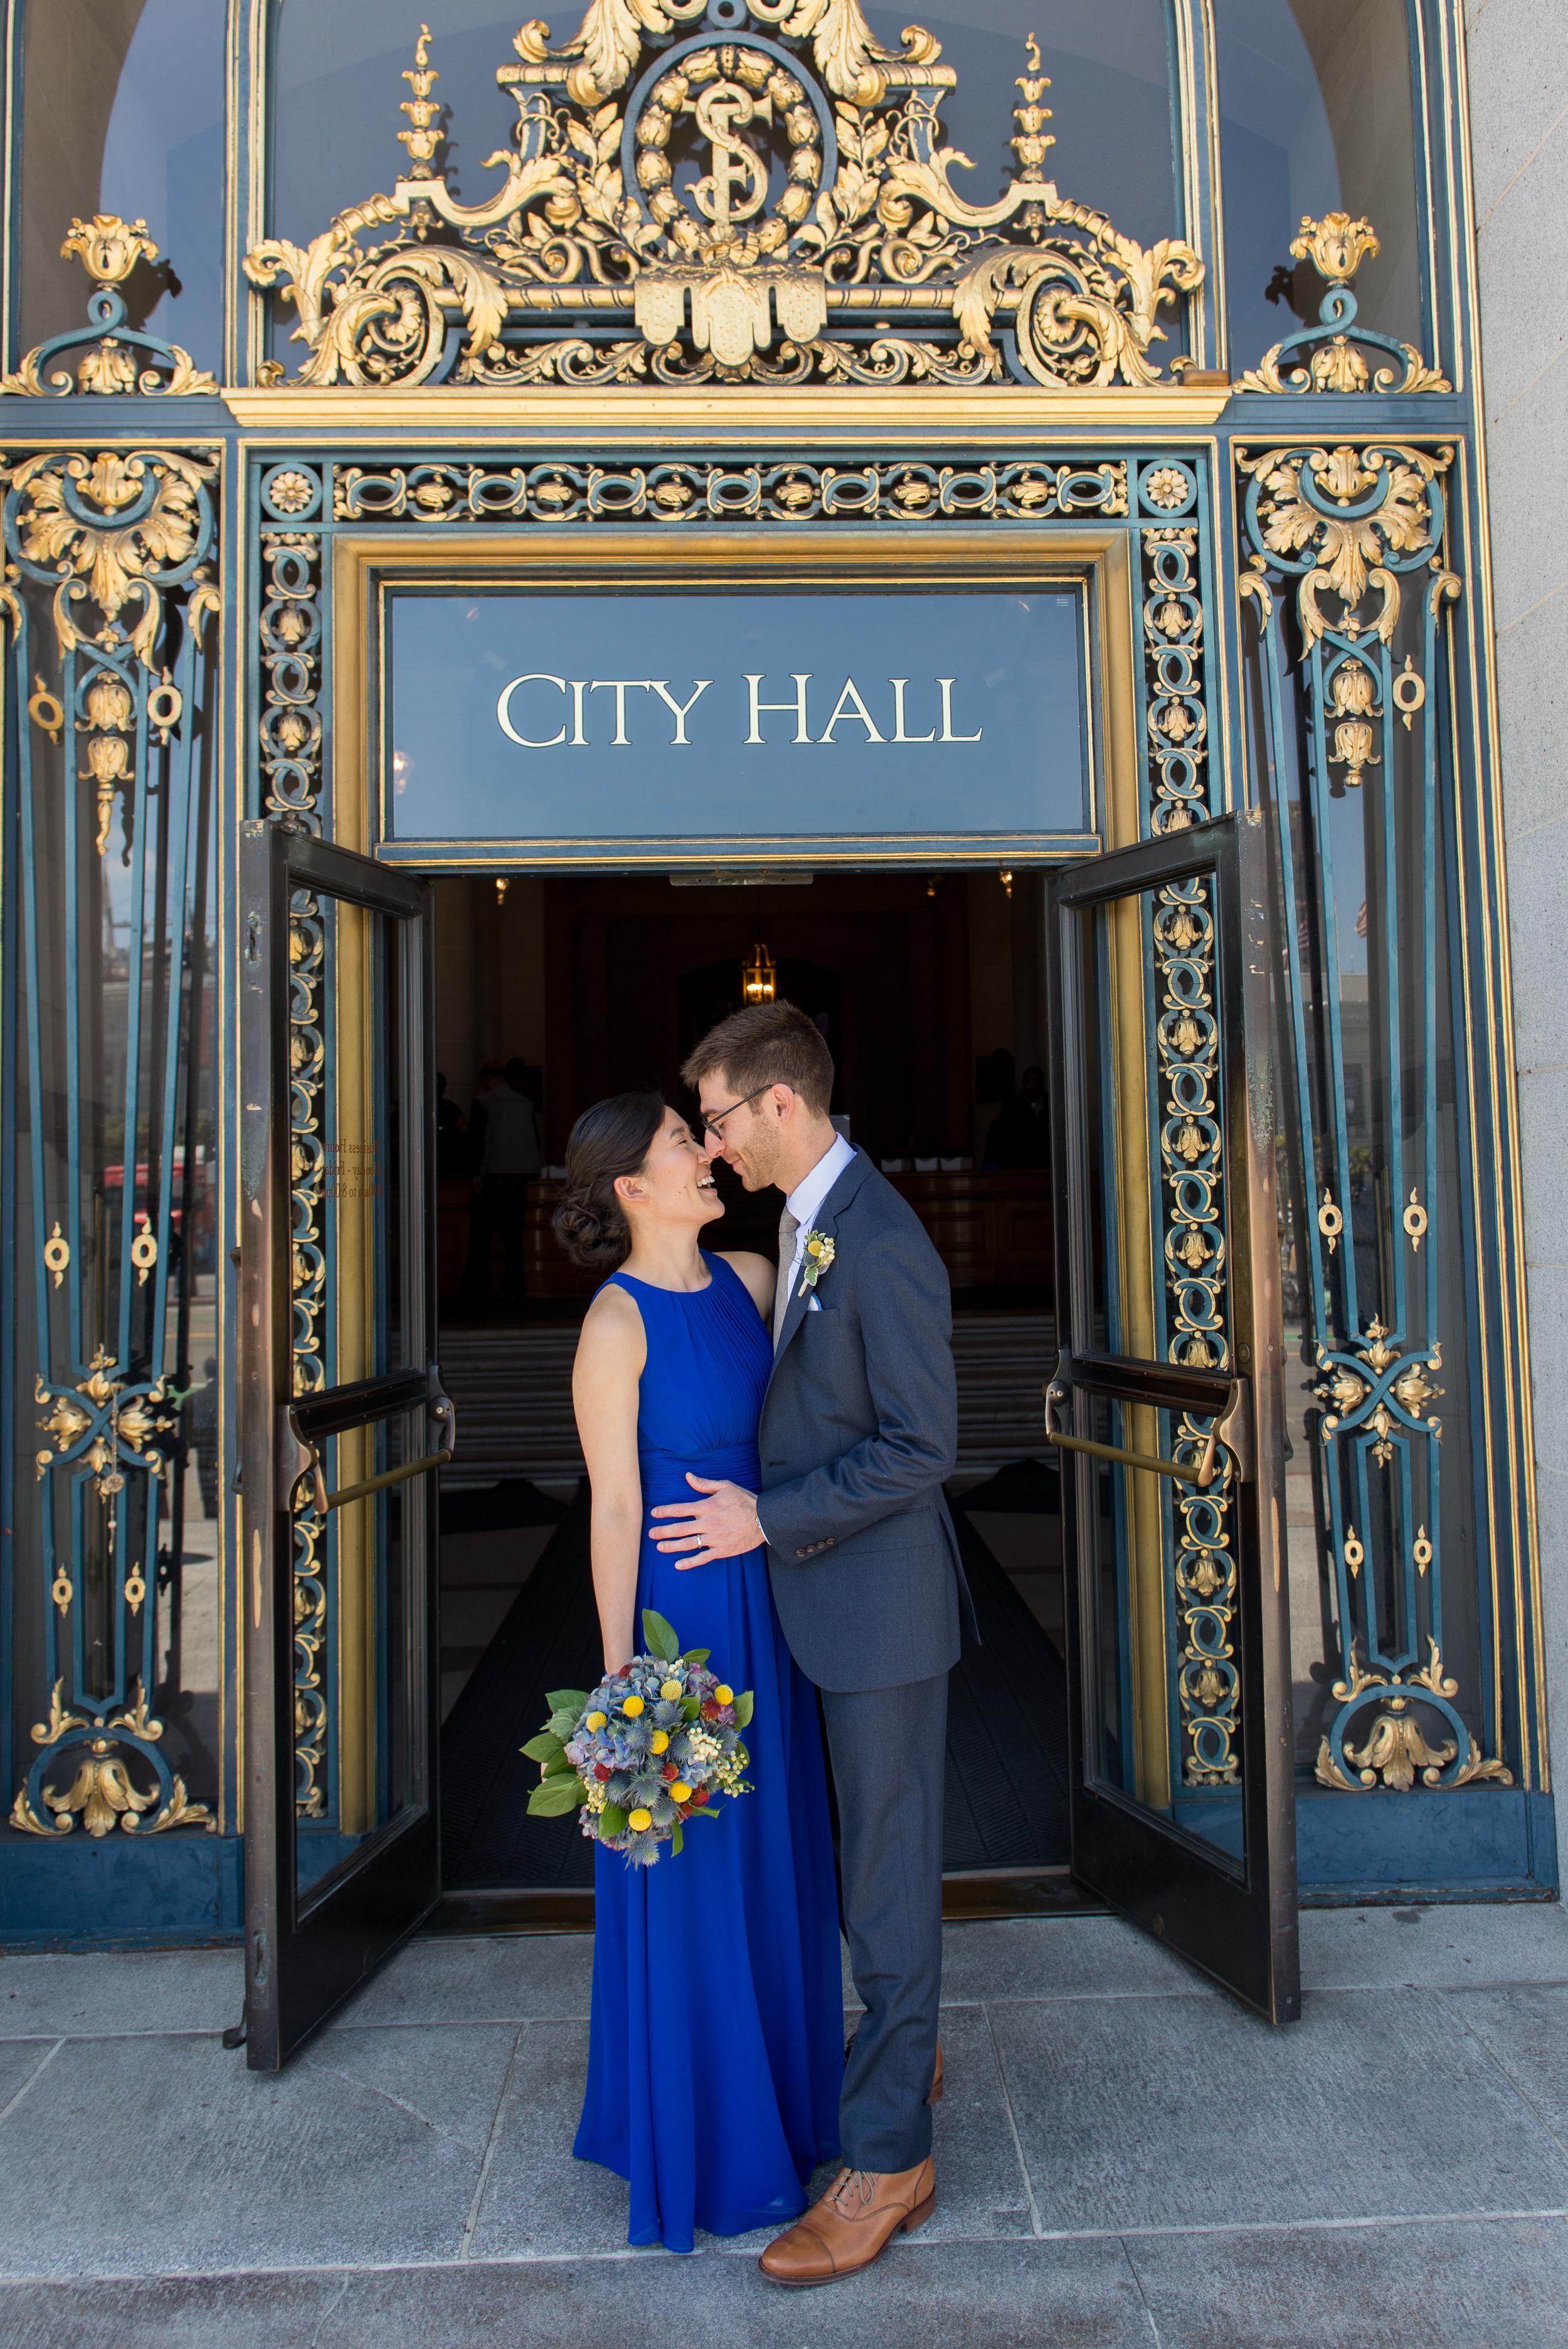 31intimate-san-francisco-city-hall-foreign-cinema-wedding.jpg